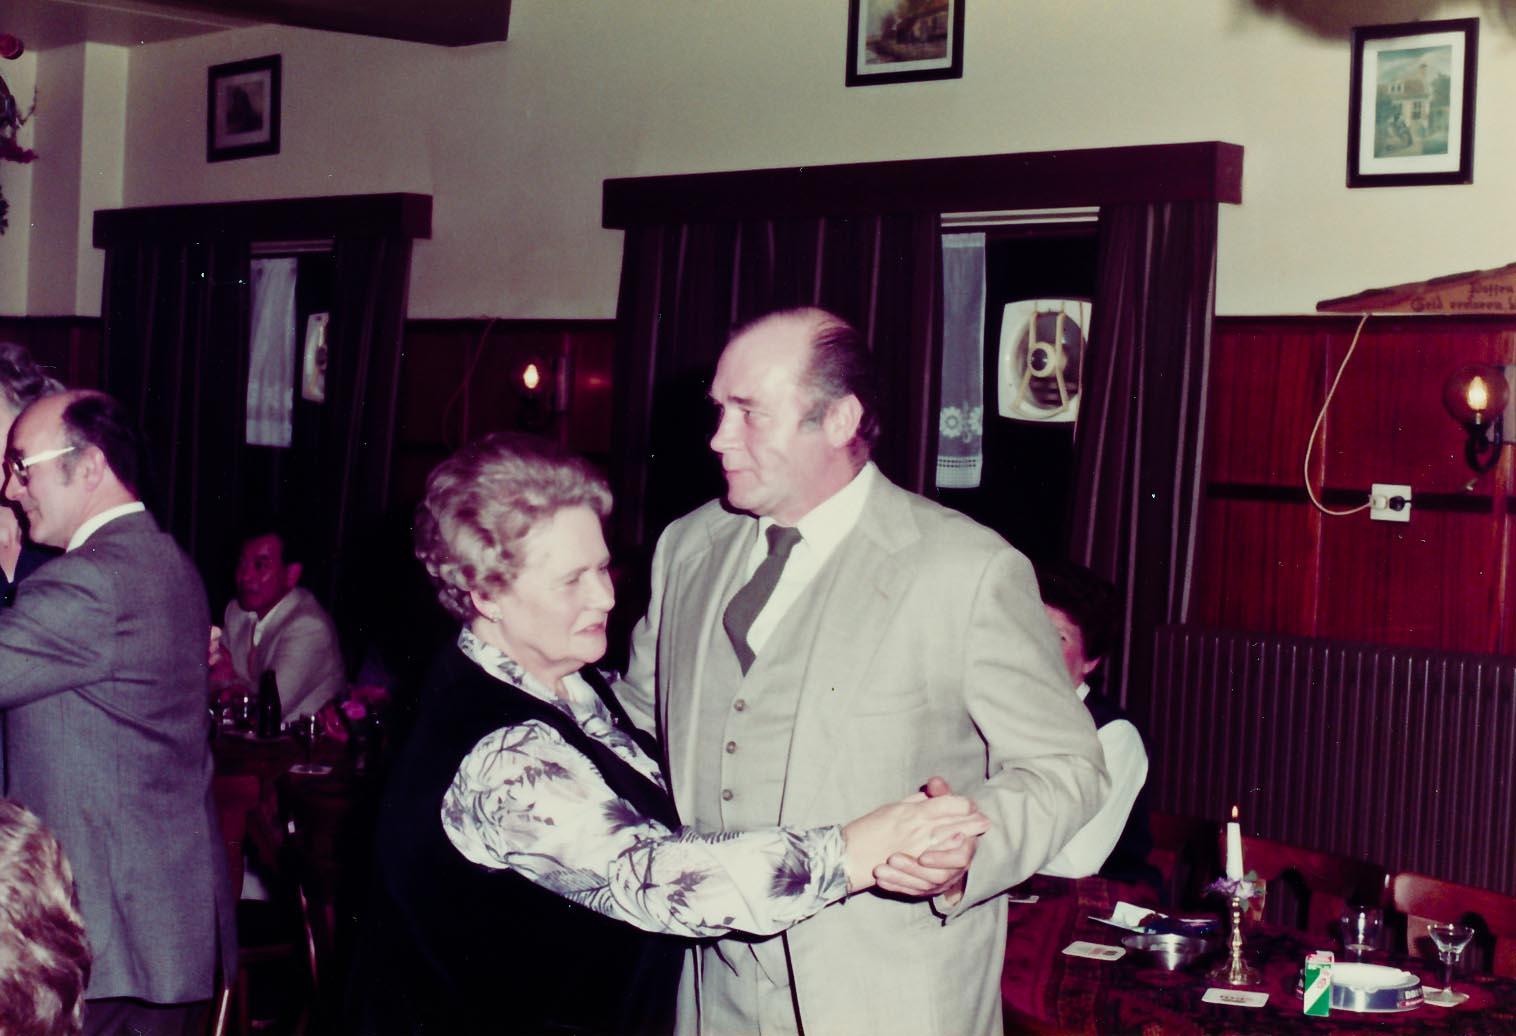 Restoring old faded photos   Lightroom Queen Forums